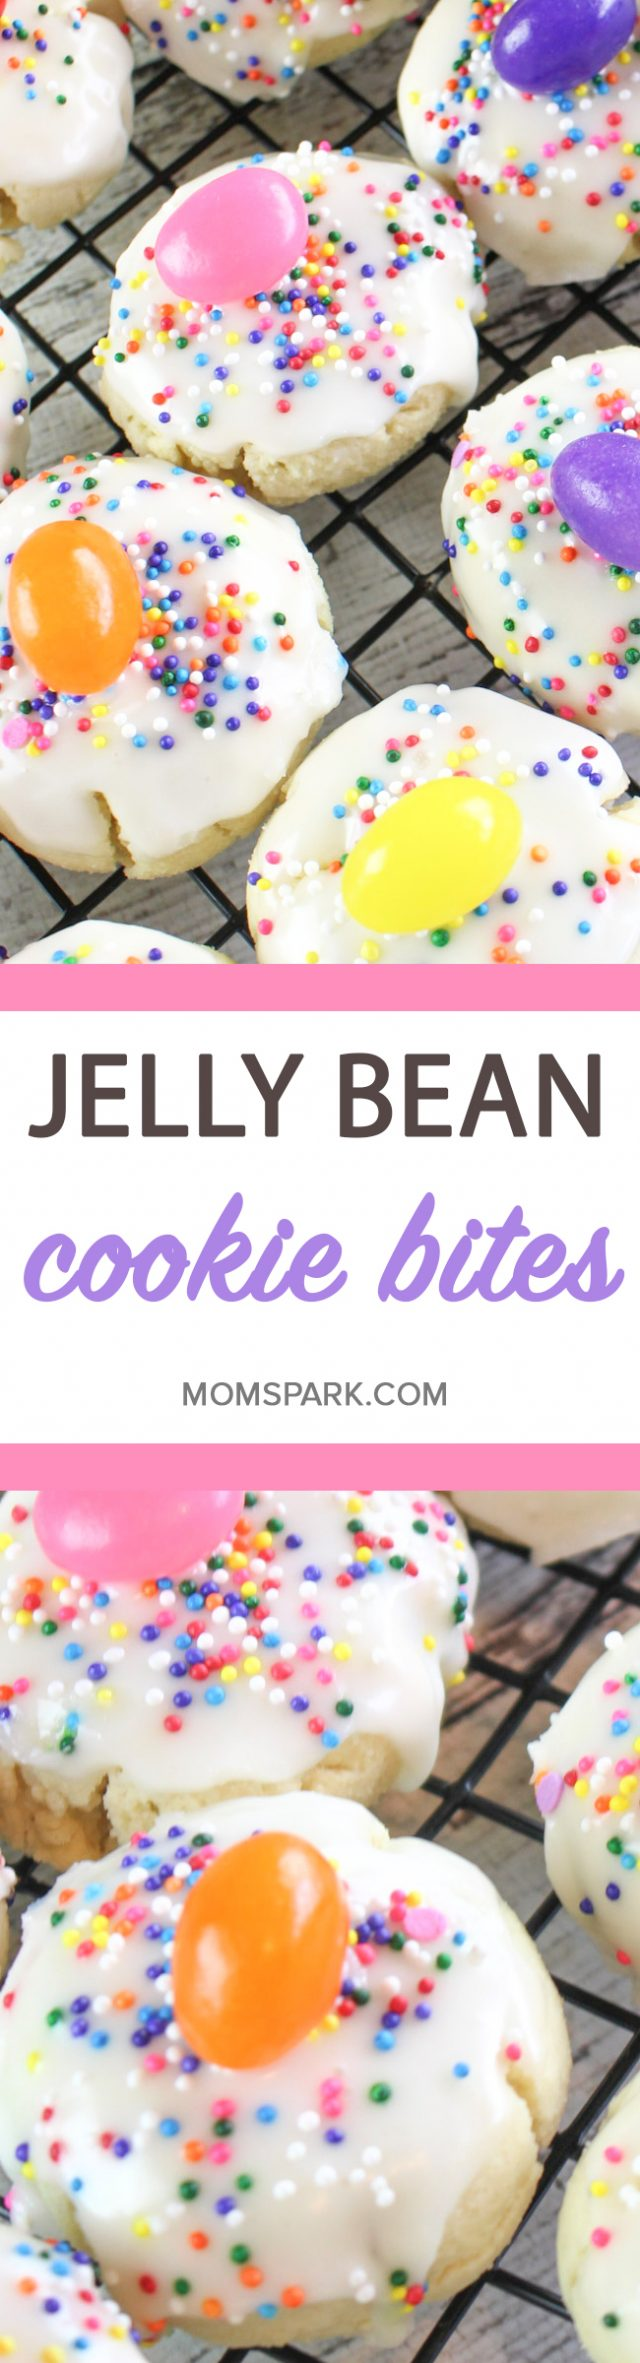 Jelly Bean Cookie Bites Recipe Mom Spark Mom Blogger